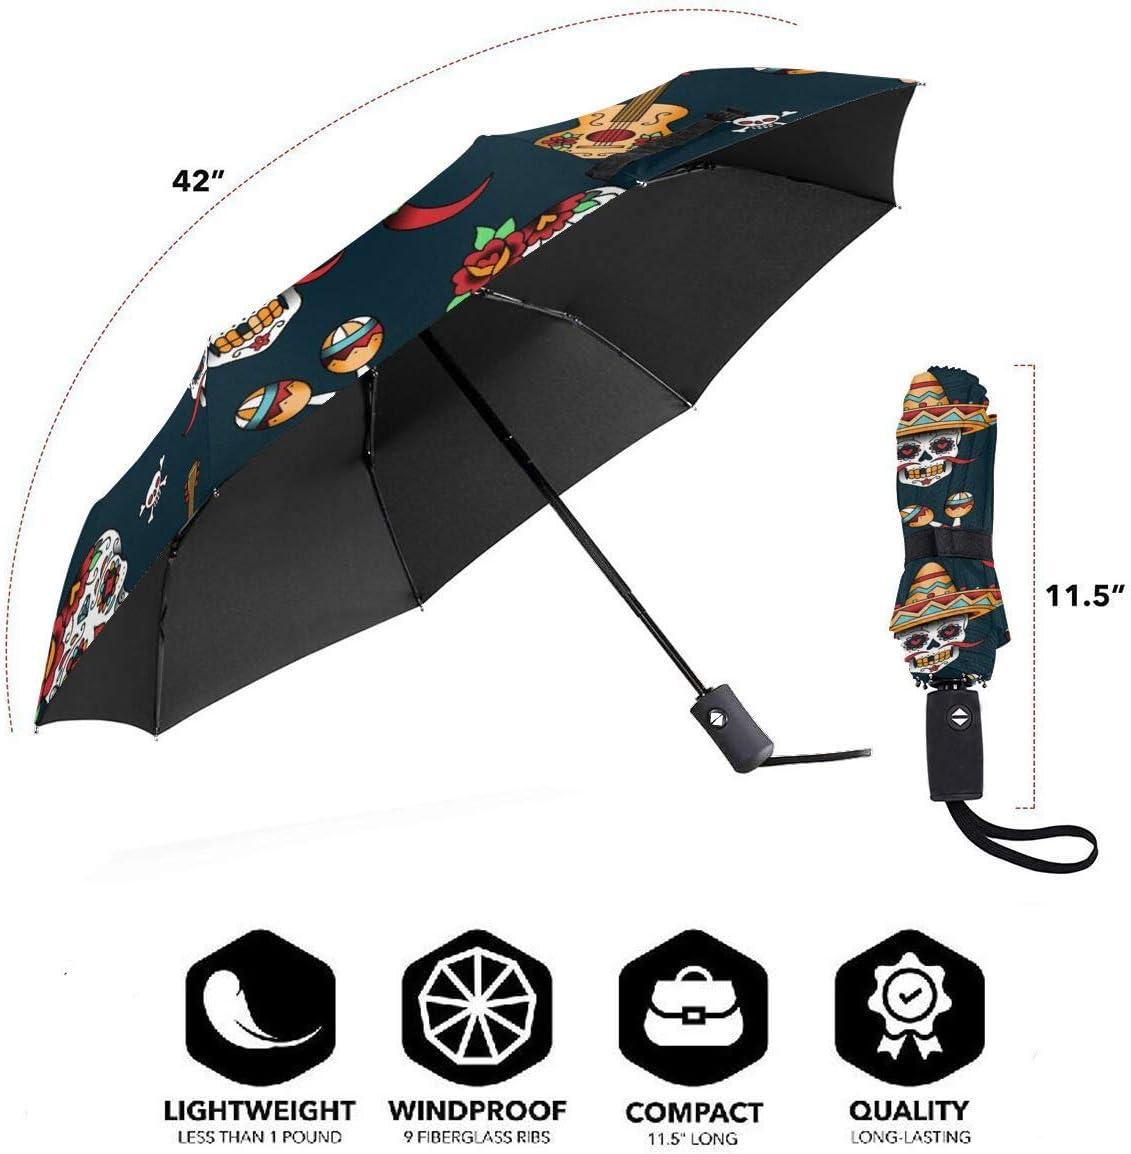 Mexican Sugar Skulls Chili Automatic Tri-fold Umbrella Stylish Windproof Anti UV Rain//Sun Travel Umbrella Light Weight.